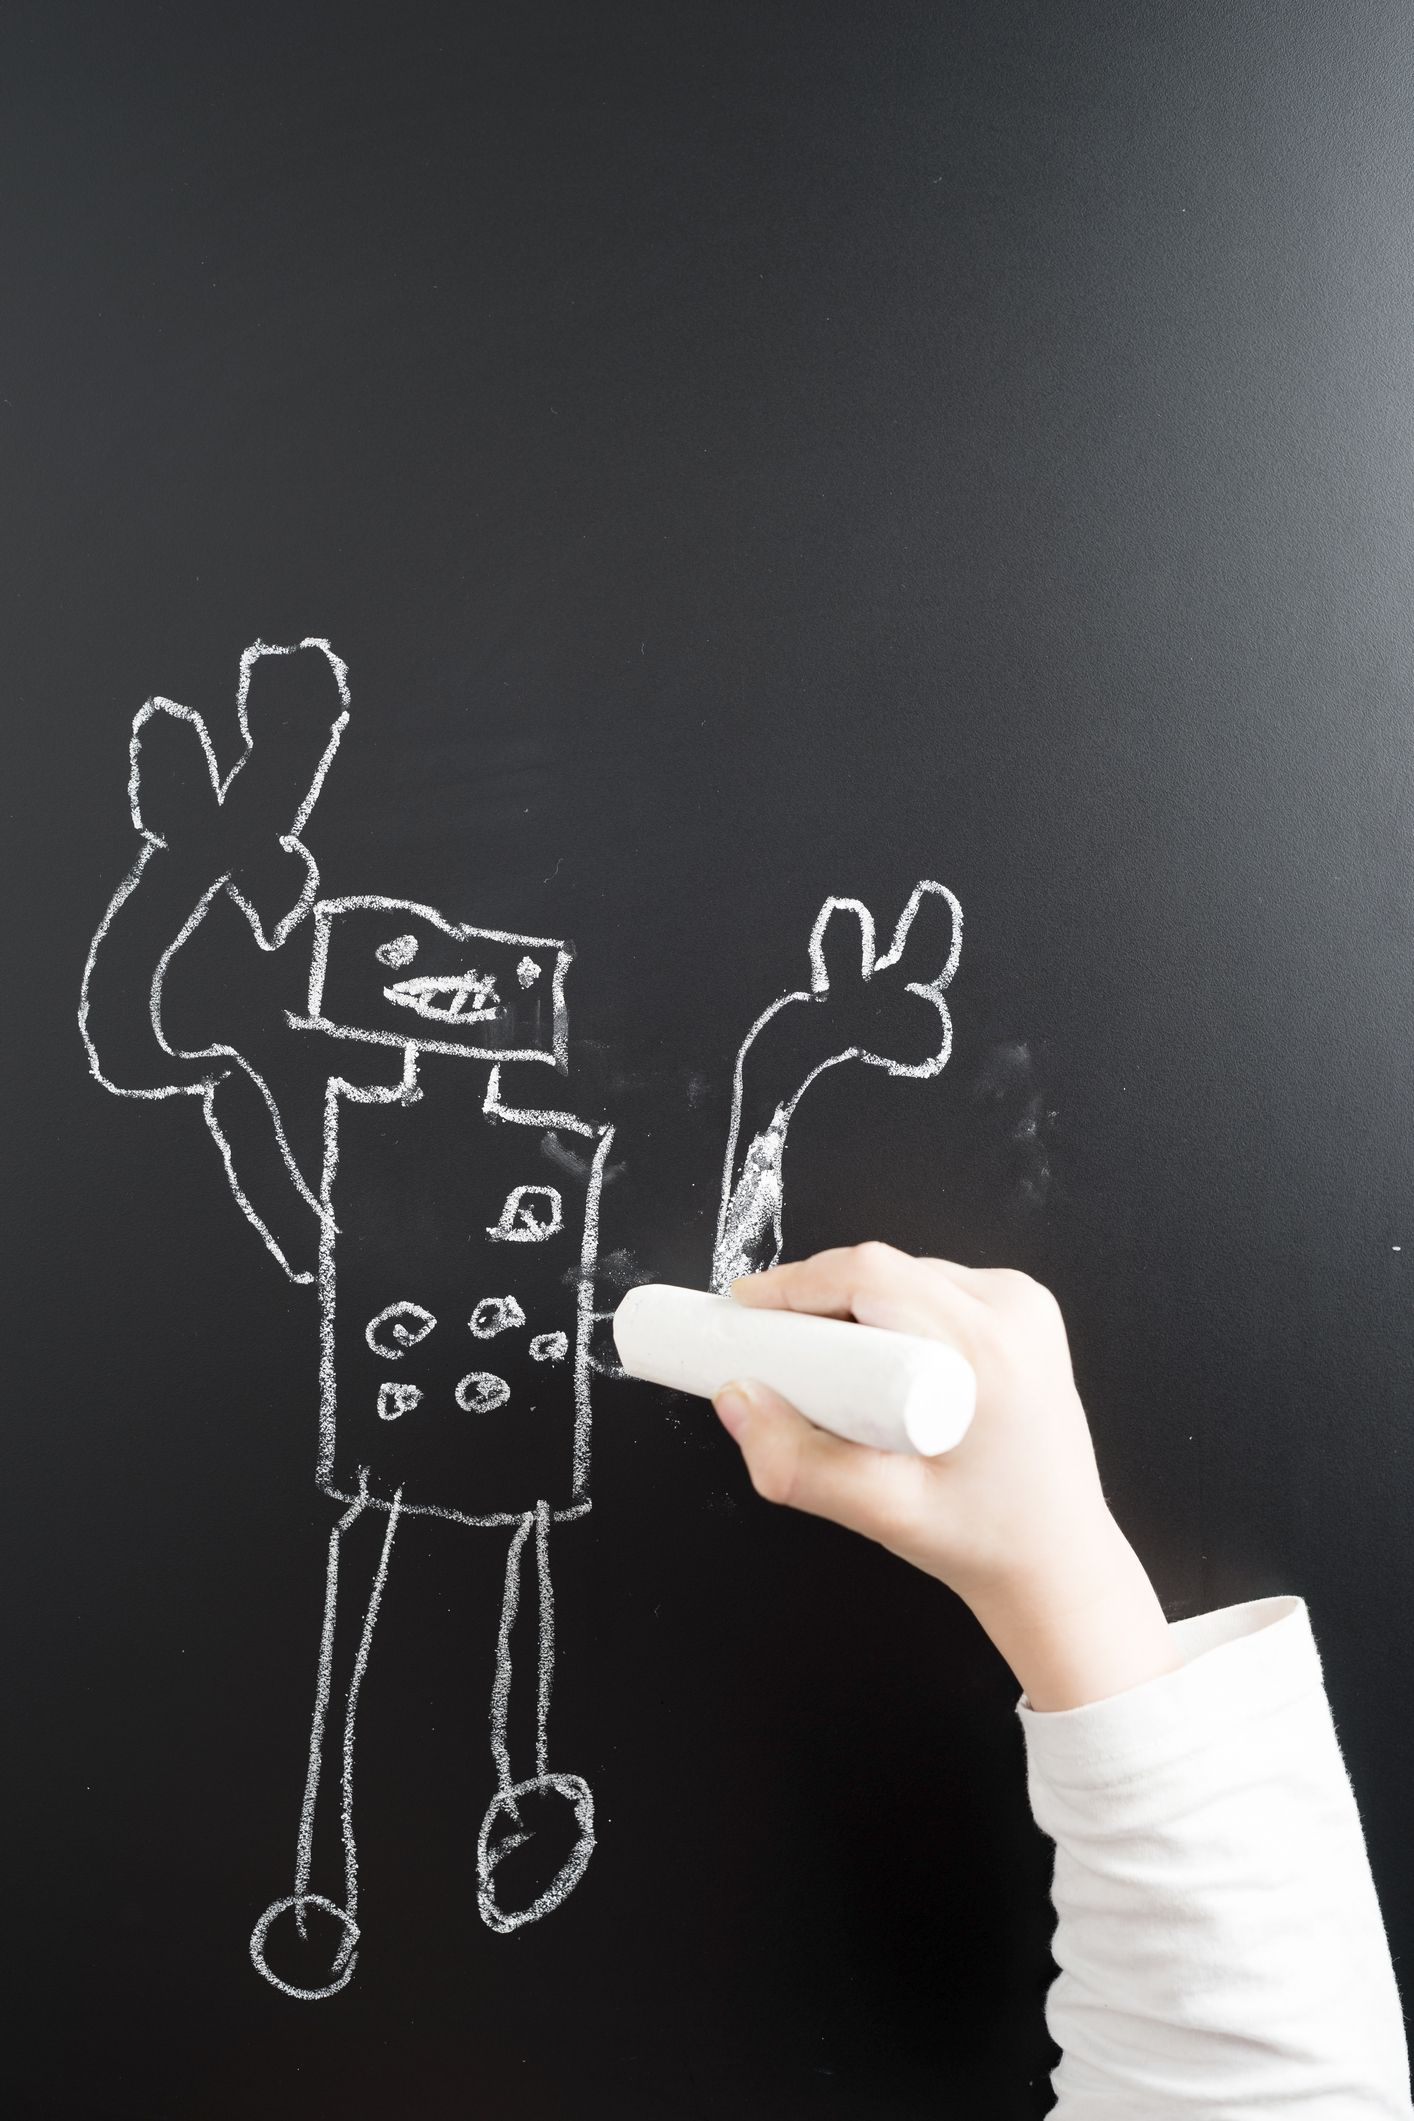 writing on black chalkboard